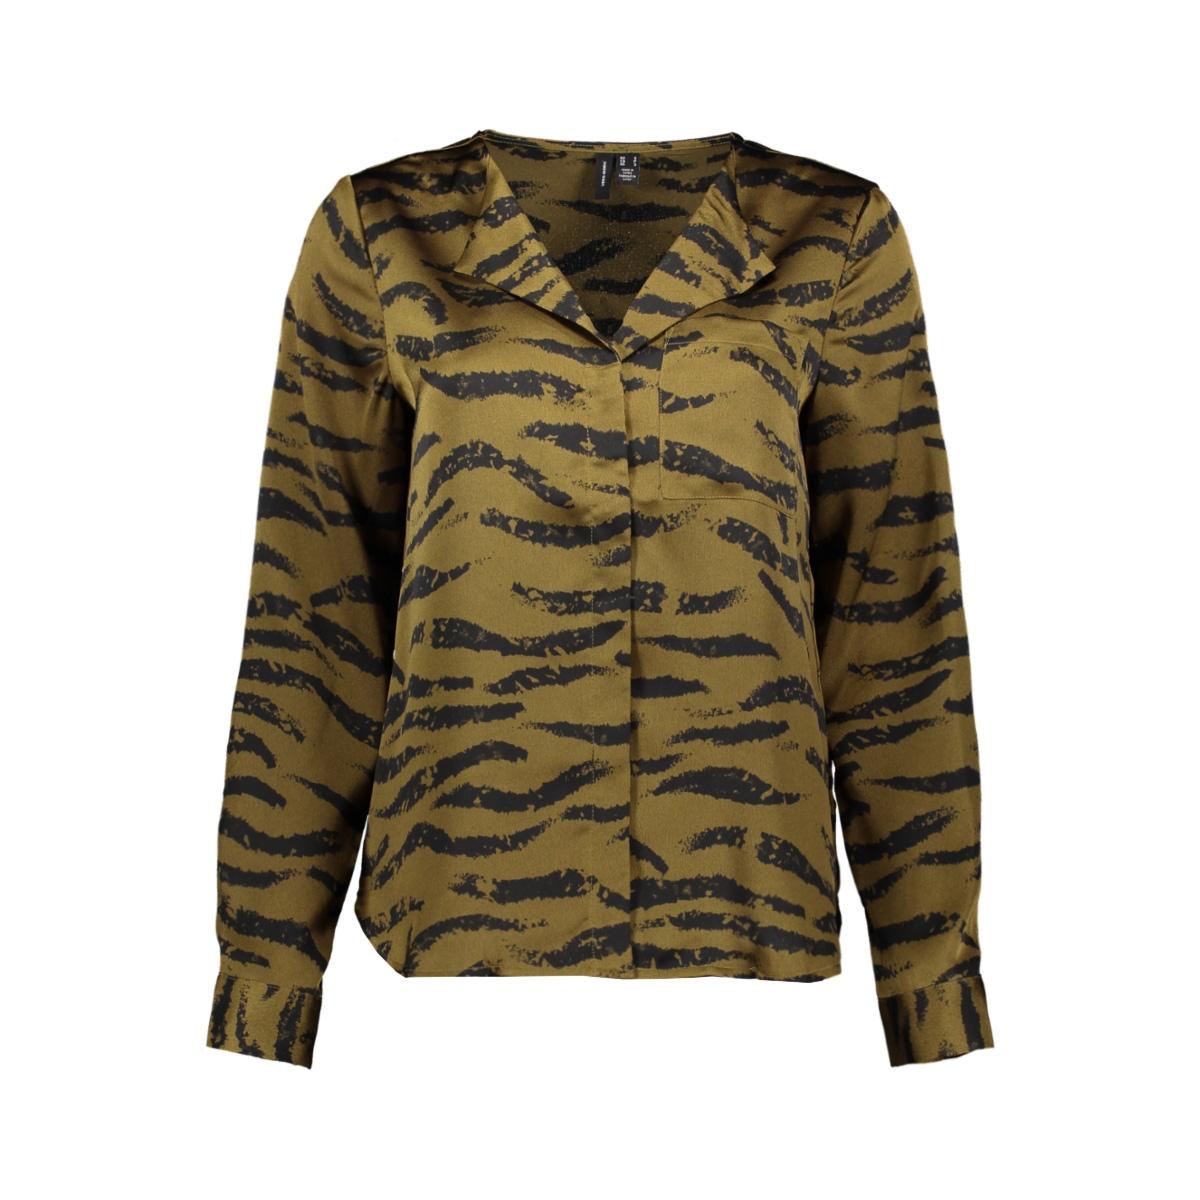 vmrina l/s v-neck shirt exp 10233078 vero moda blouse military olive/rina